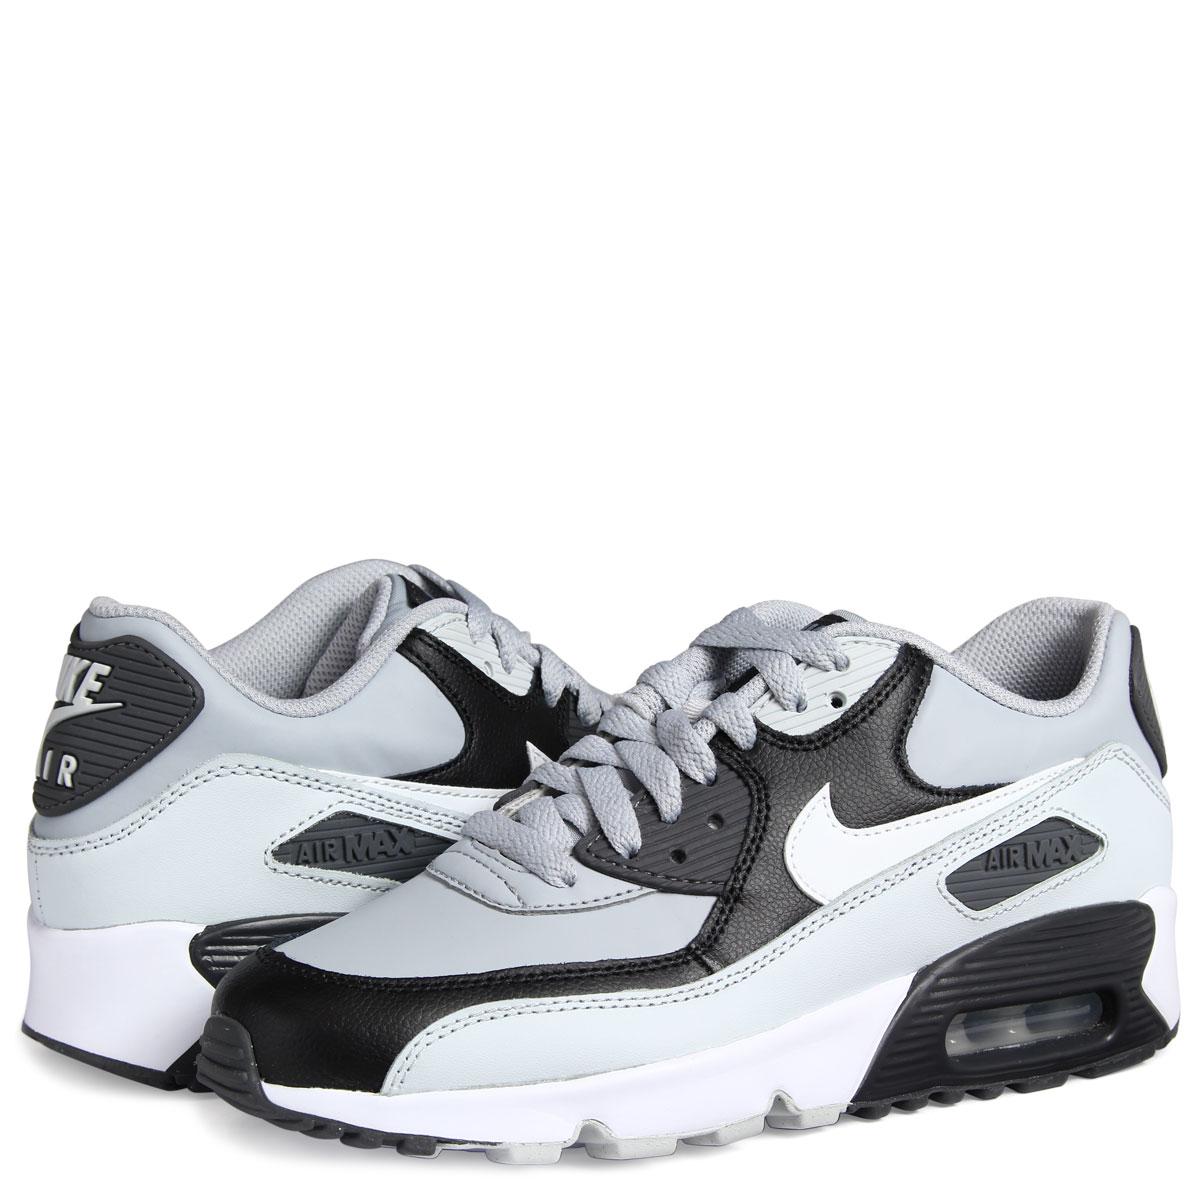 NIKE load1710 Ney Lady's 90 412 AIR sneakers 833 MAX LEATHER gray1016 016 shoes Shinnyu Kie AMAX 90 GS yOvN0wm8n